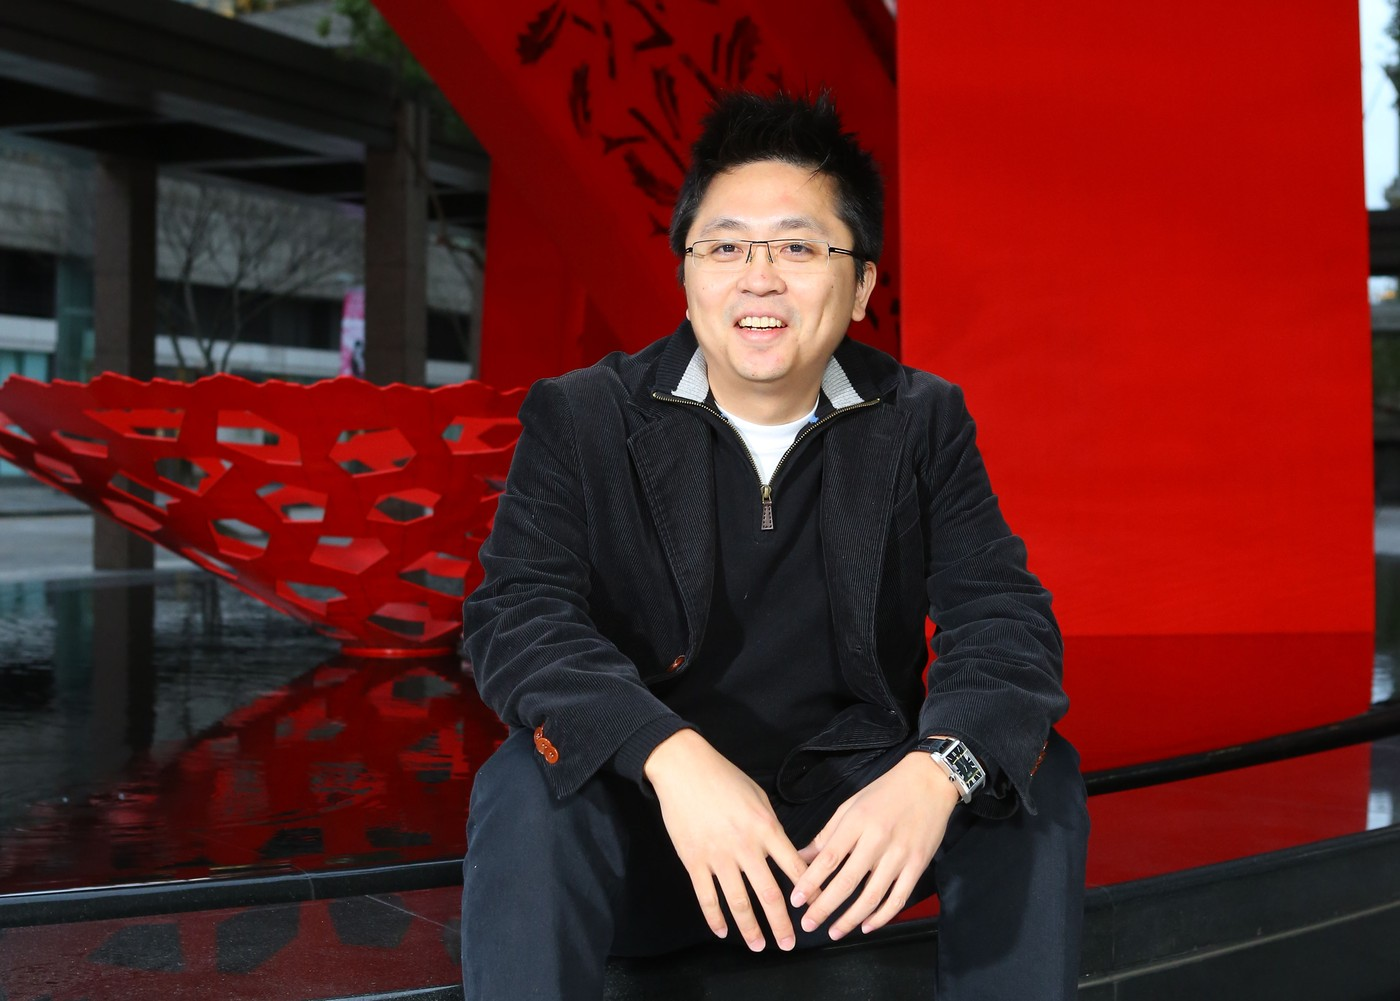 HWTrek新添亞馬遜、軟銀兩大夥伴,明年加速日本、中國佈局